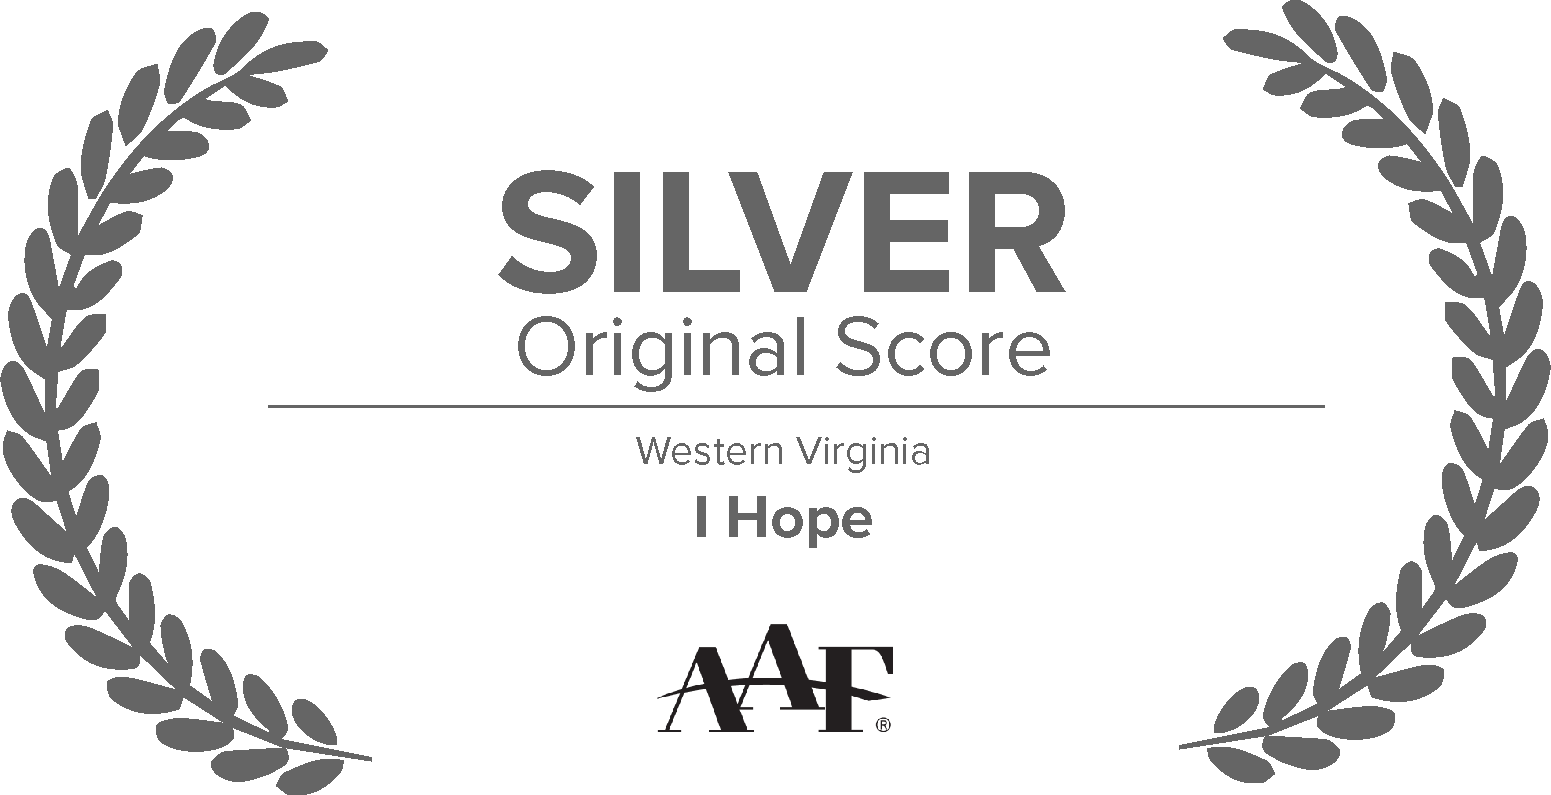 AAF_Silver_ Original Score@3x.png